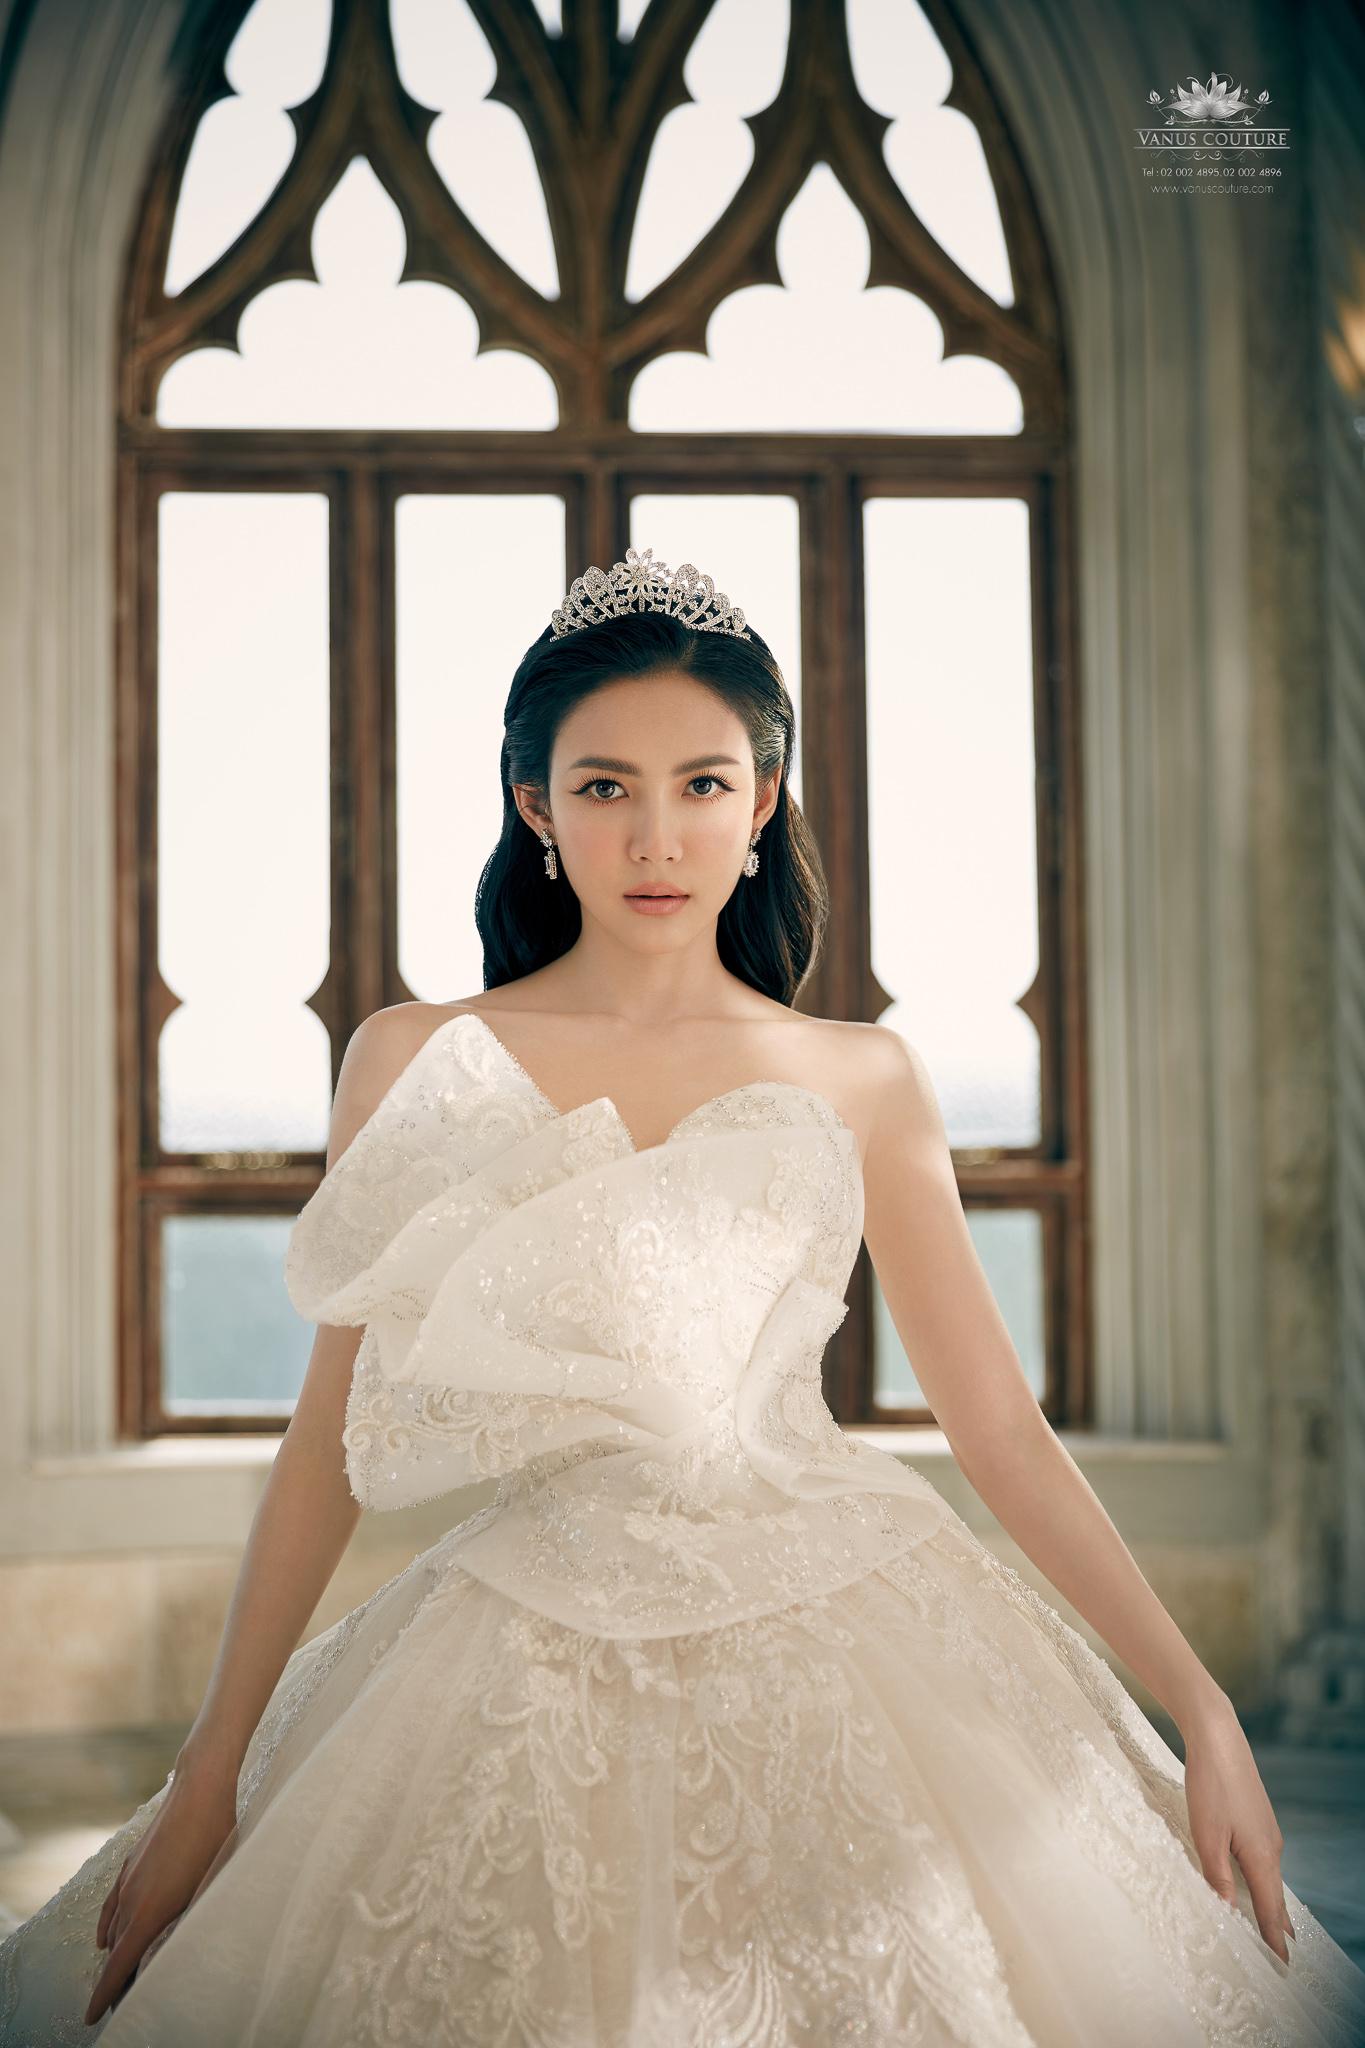 Superball wedding dress - Gybzy 01